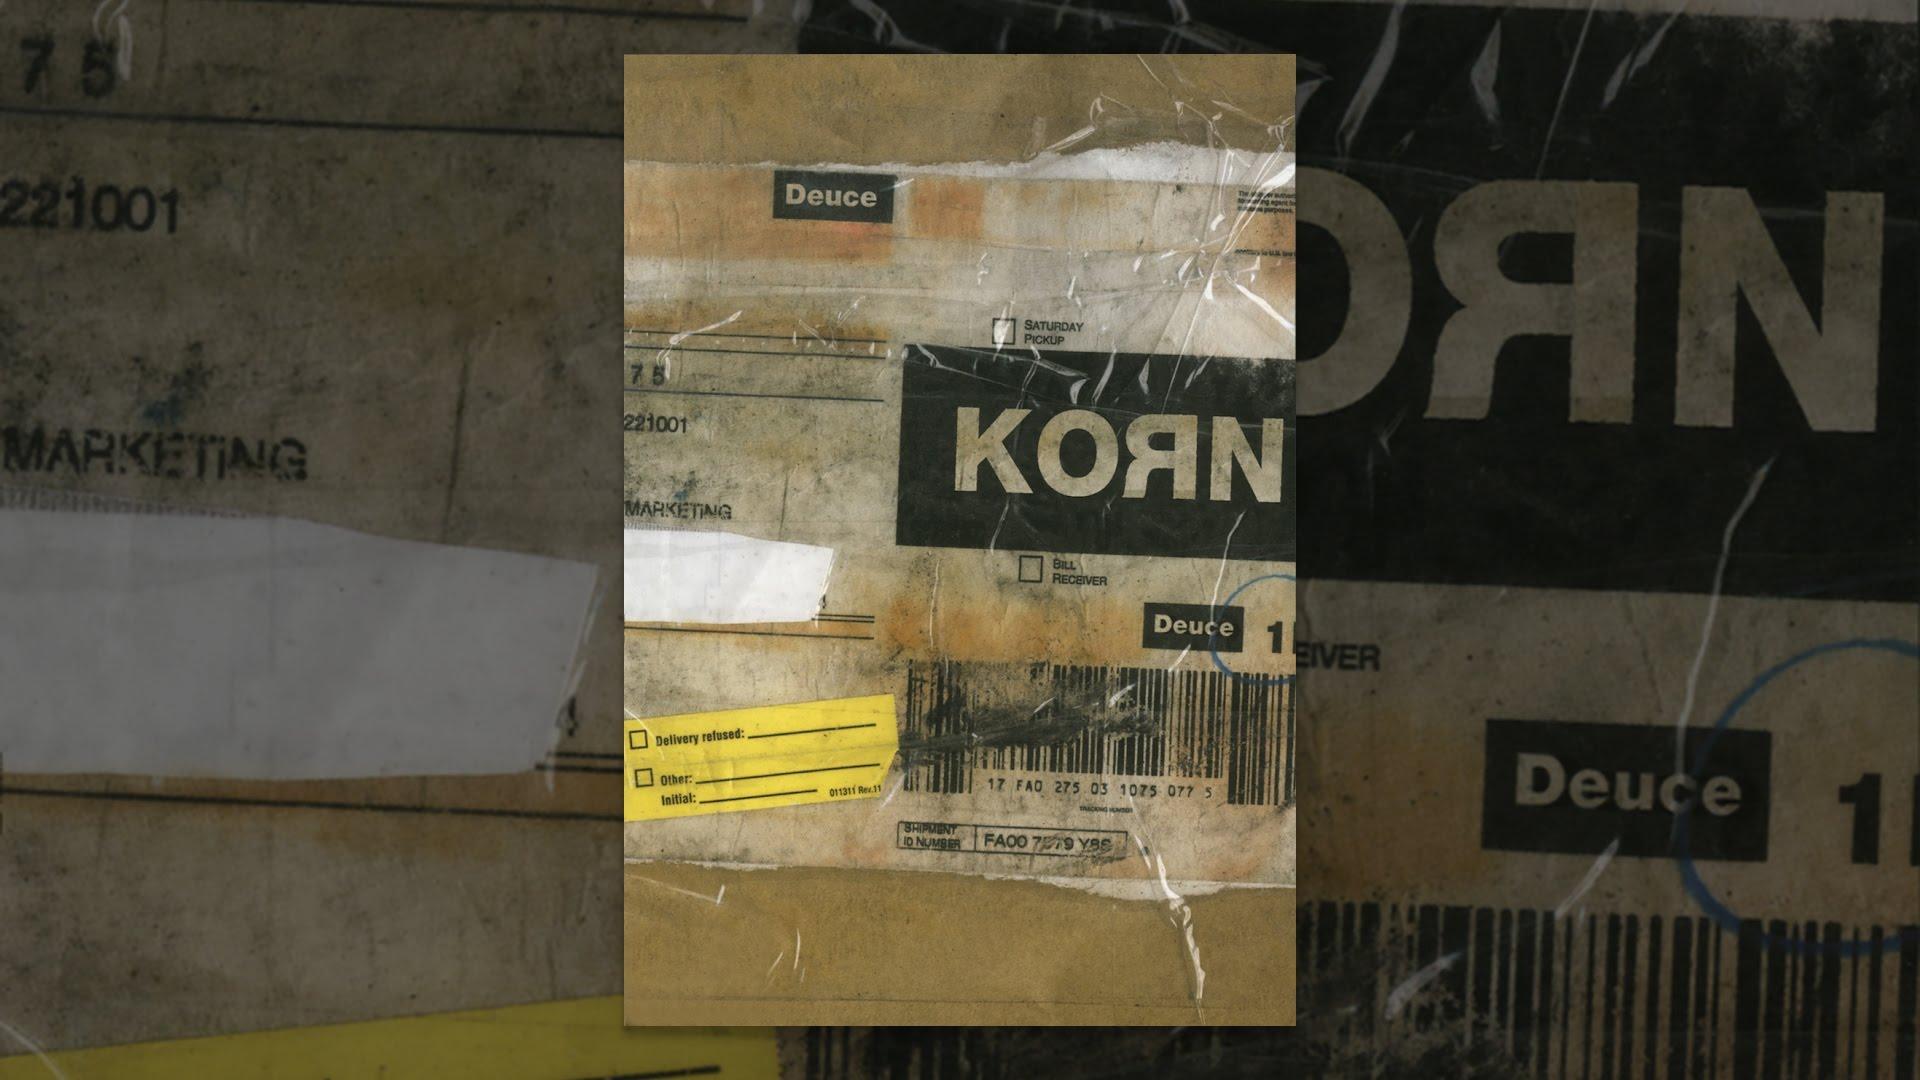 [VIDEO] - Korn: Deuce 4